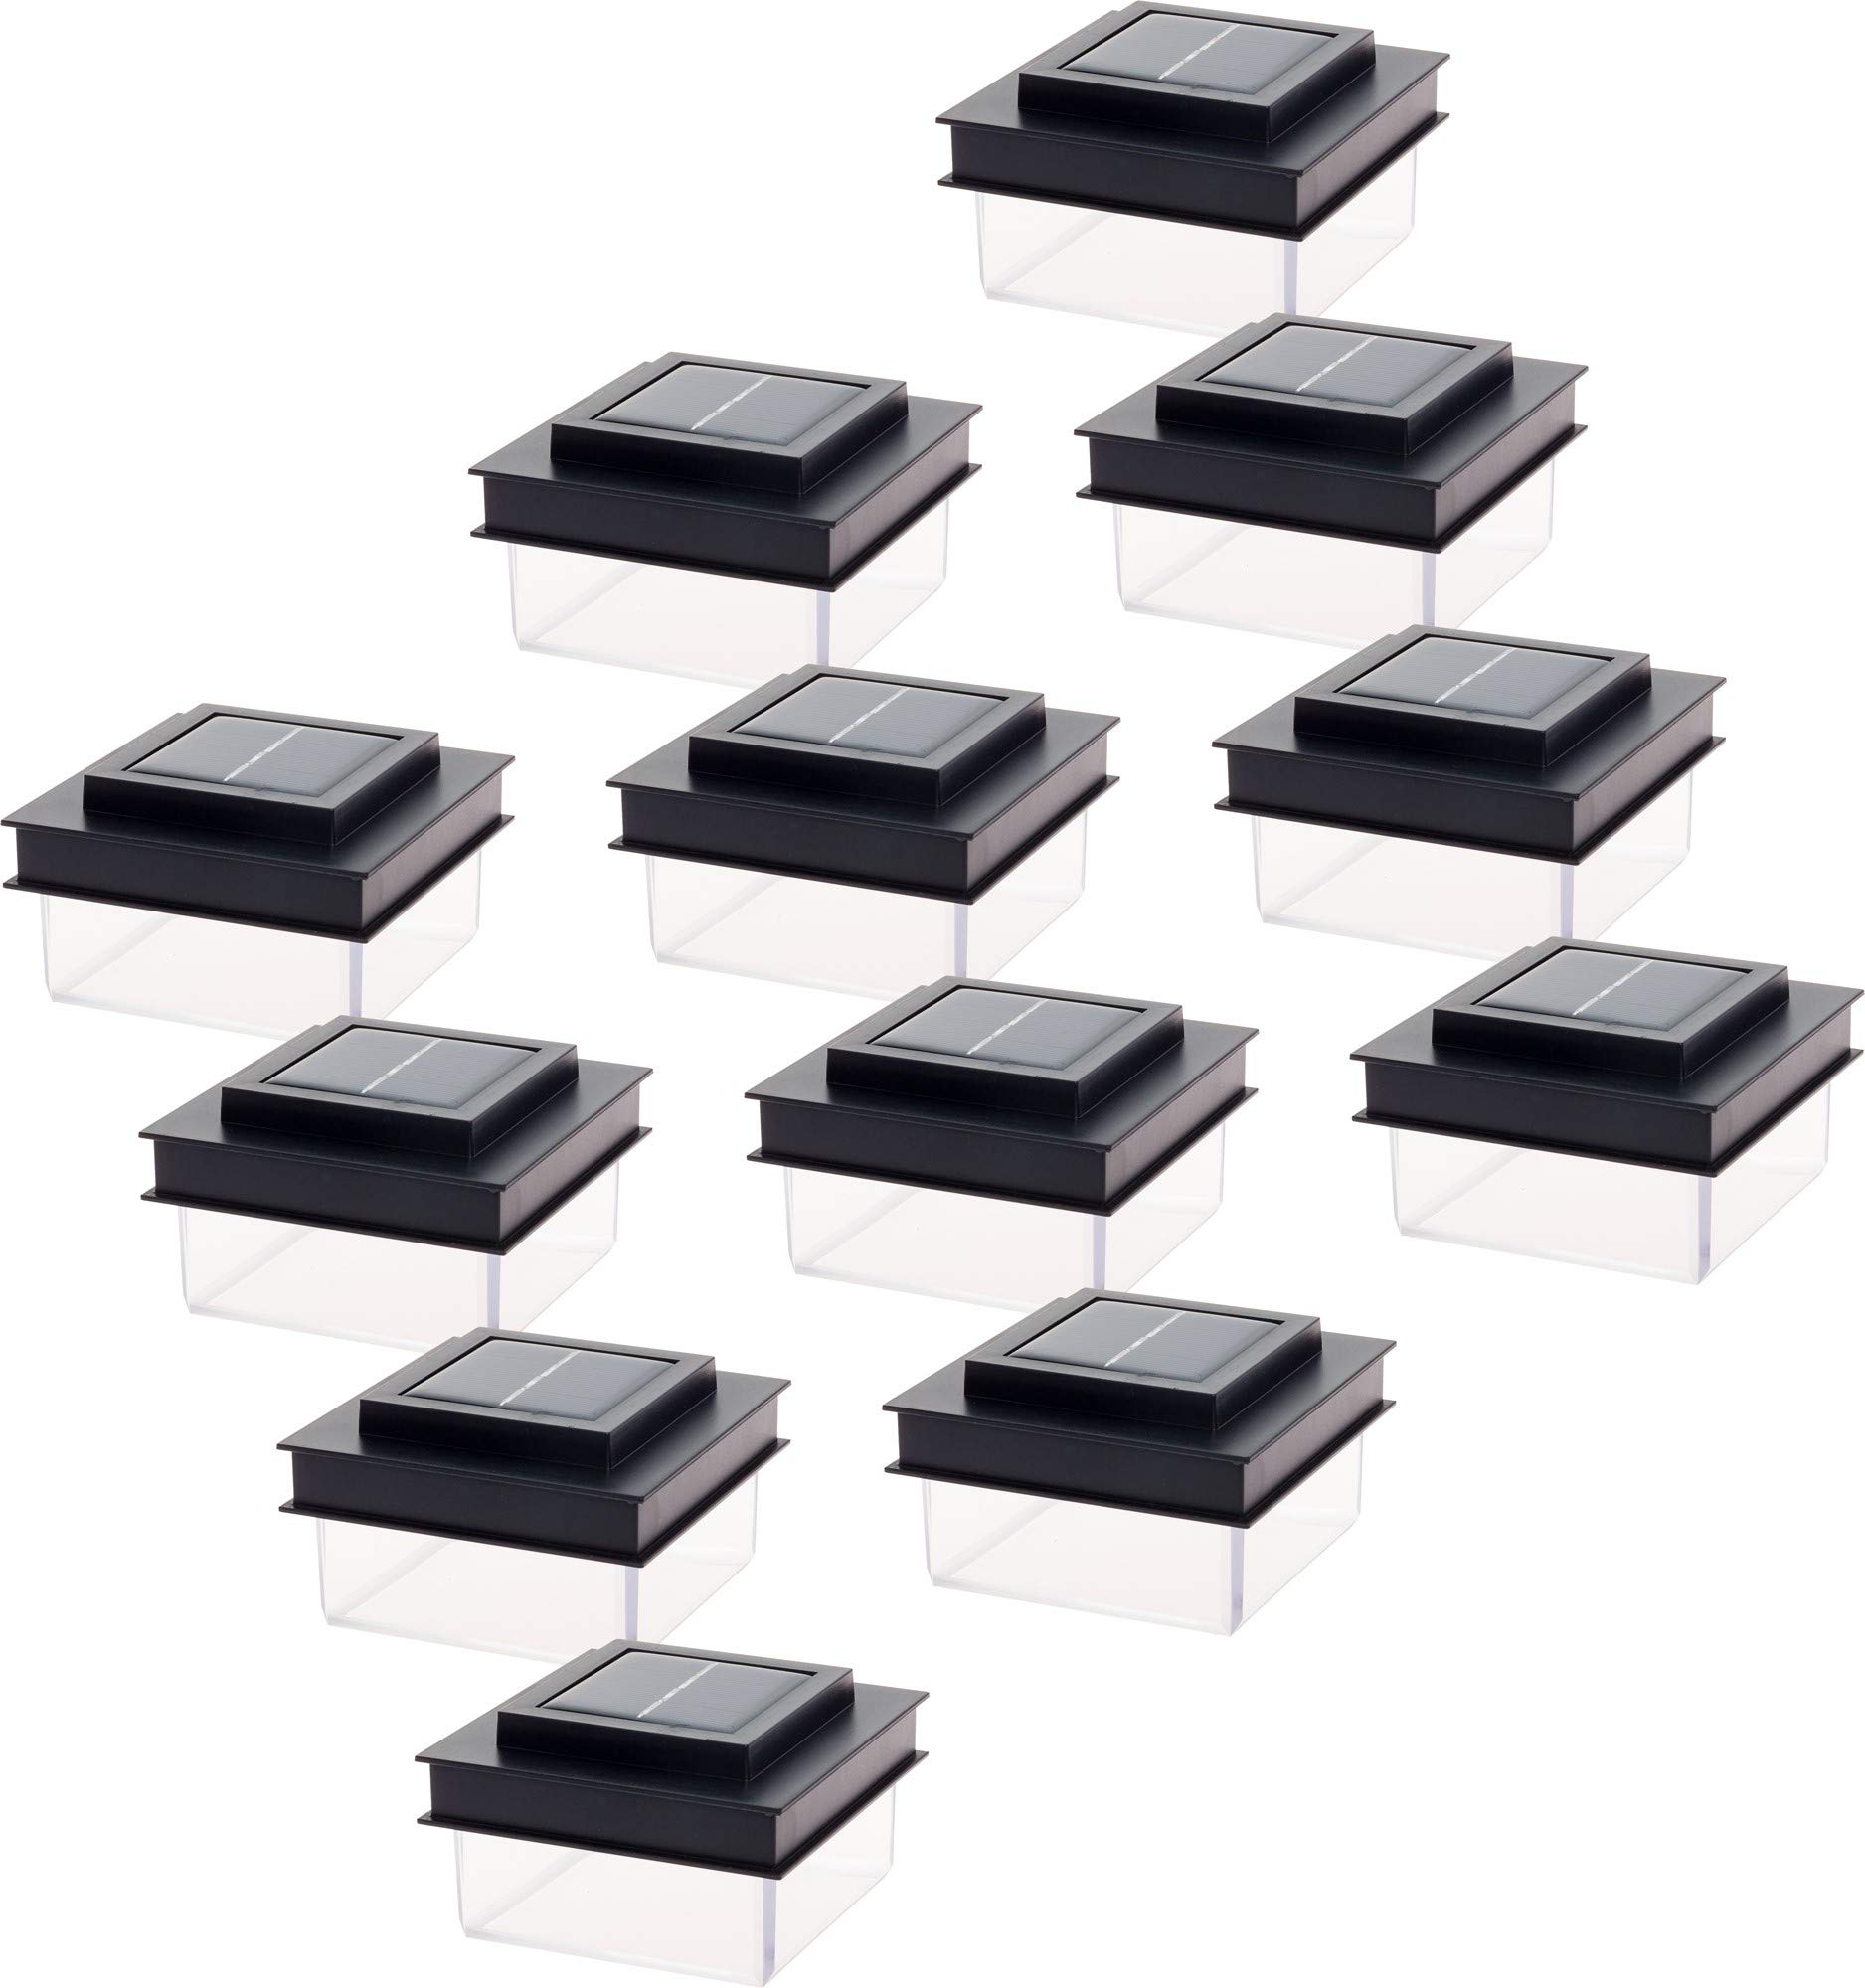 GreenLighting Translucent 12 Lumen LED Solar Powered Post Cap Light for 4x4 Wood Posts (12 Pack, Black) by GreenLighting (Image #1)